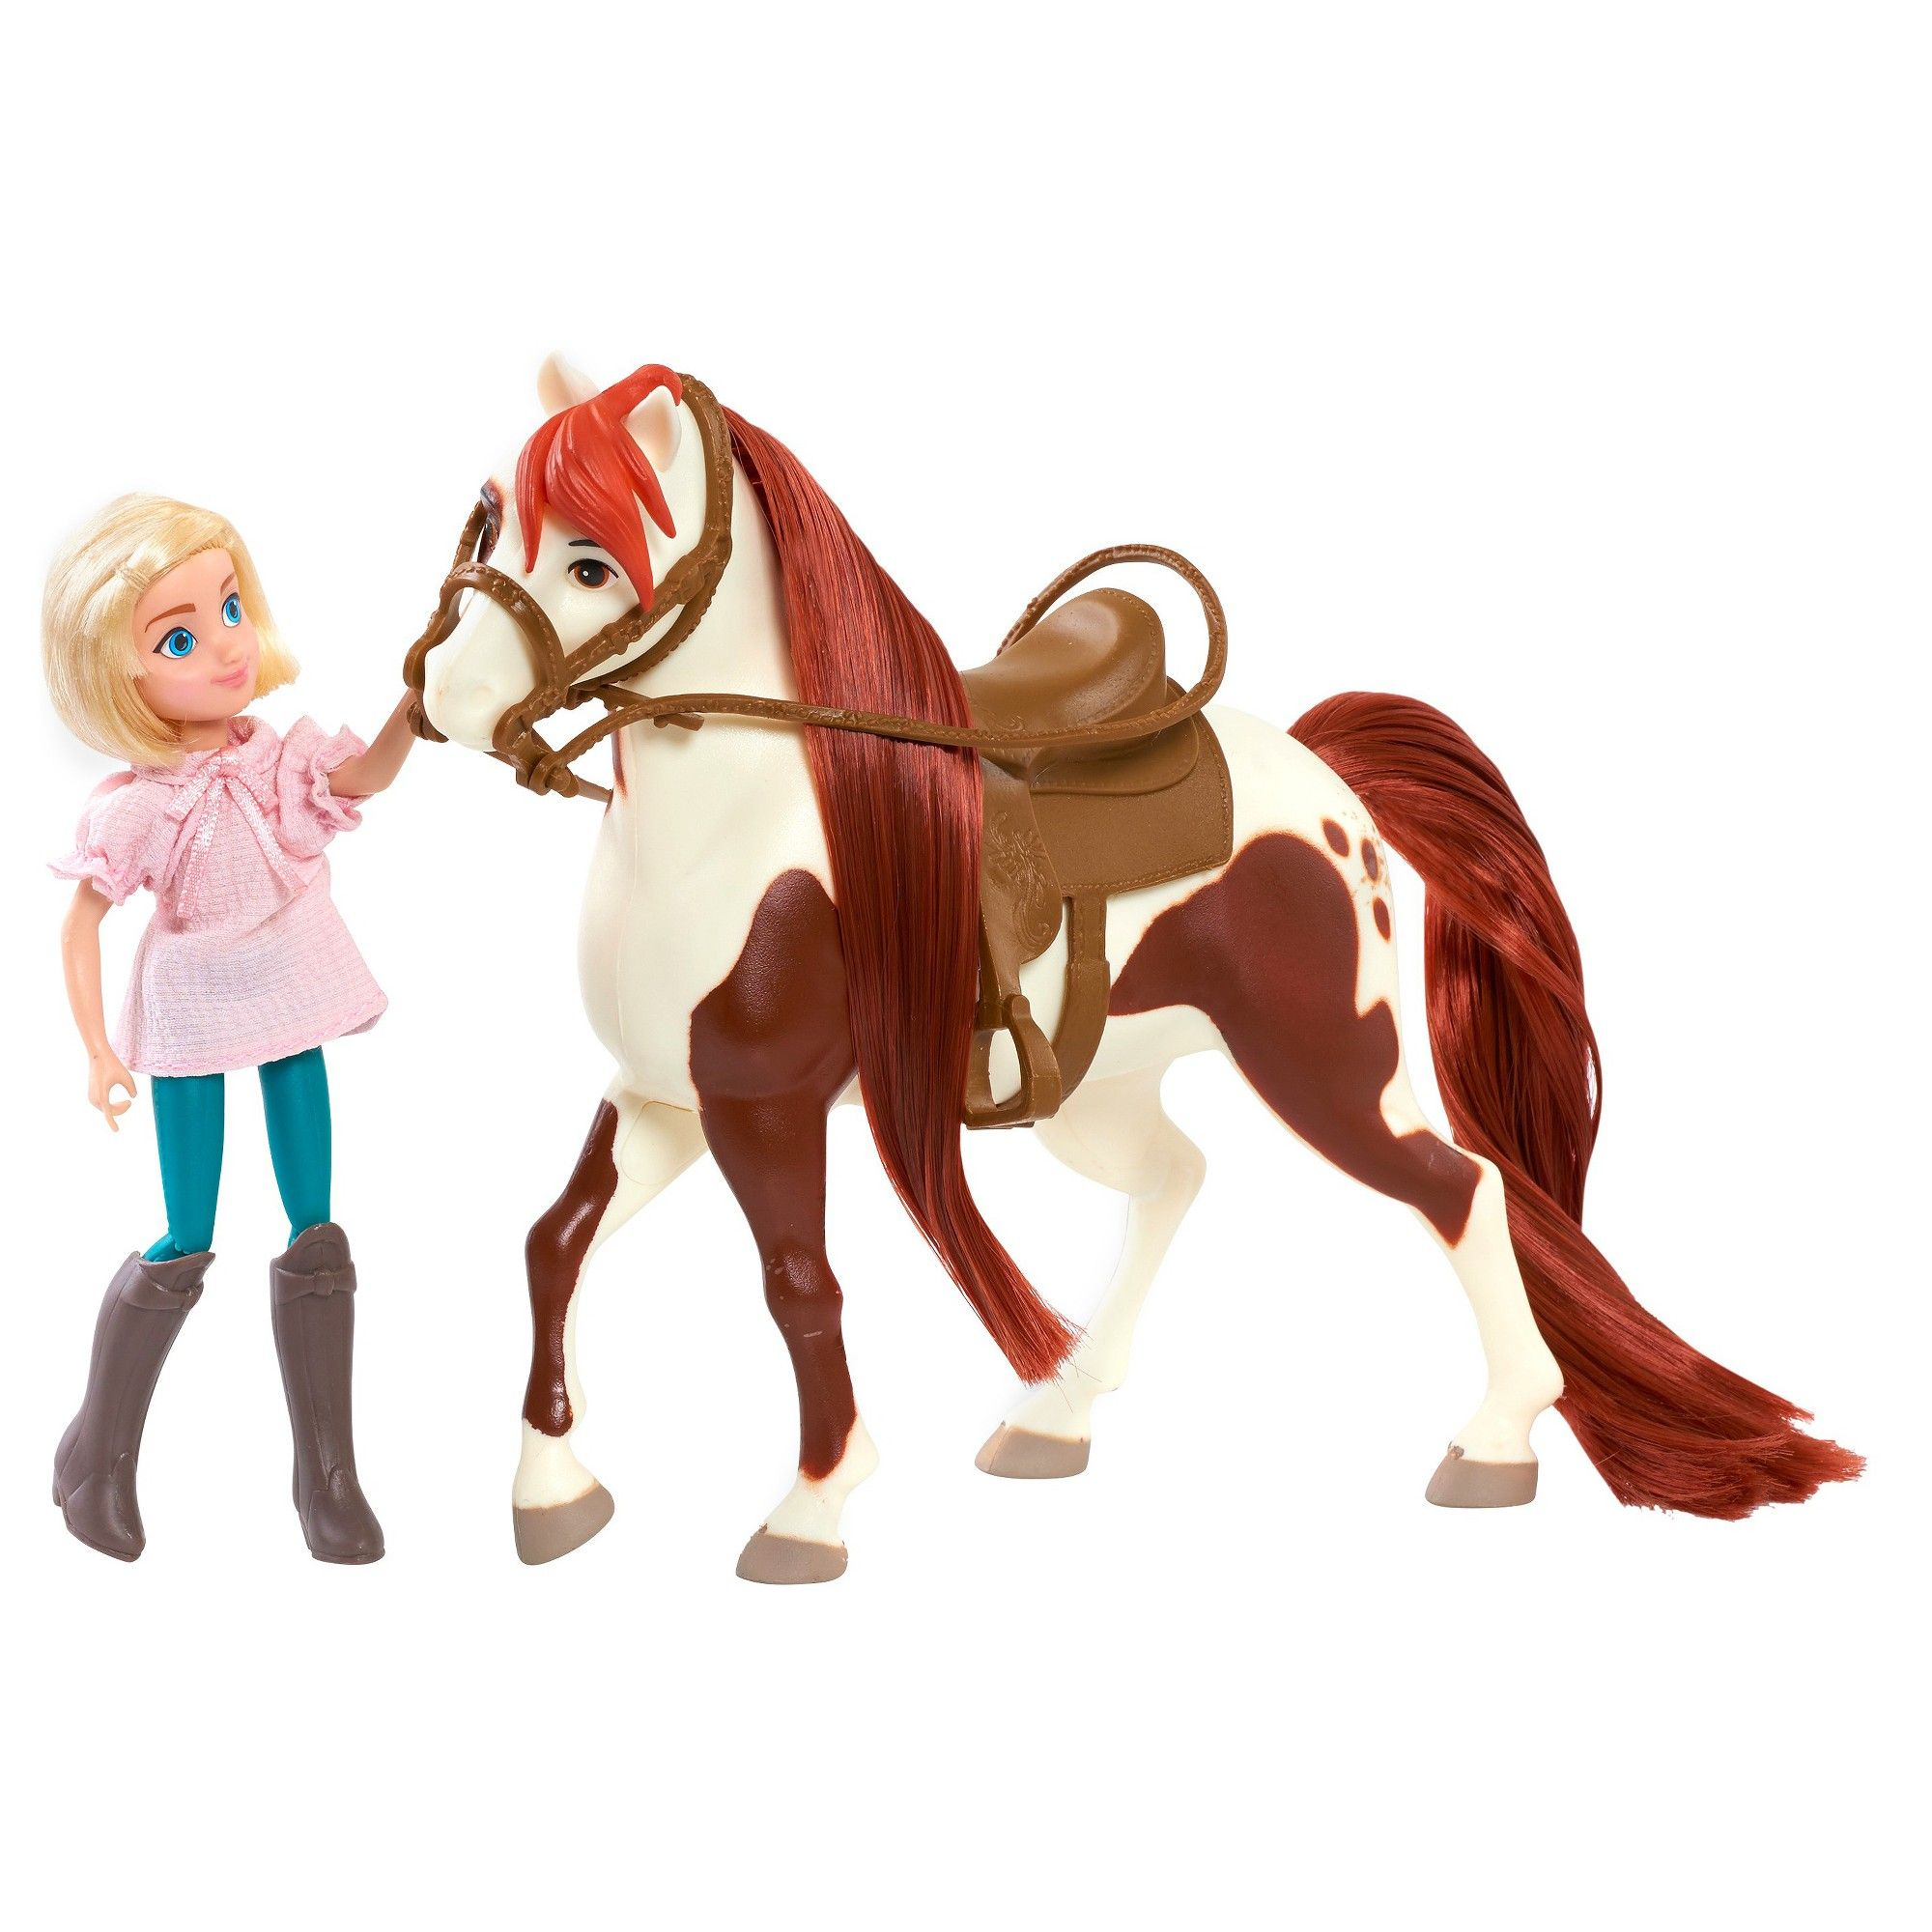 Spirit Riding Free Small Doll & Classic Horse Abigail